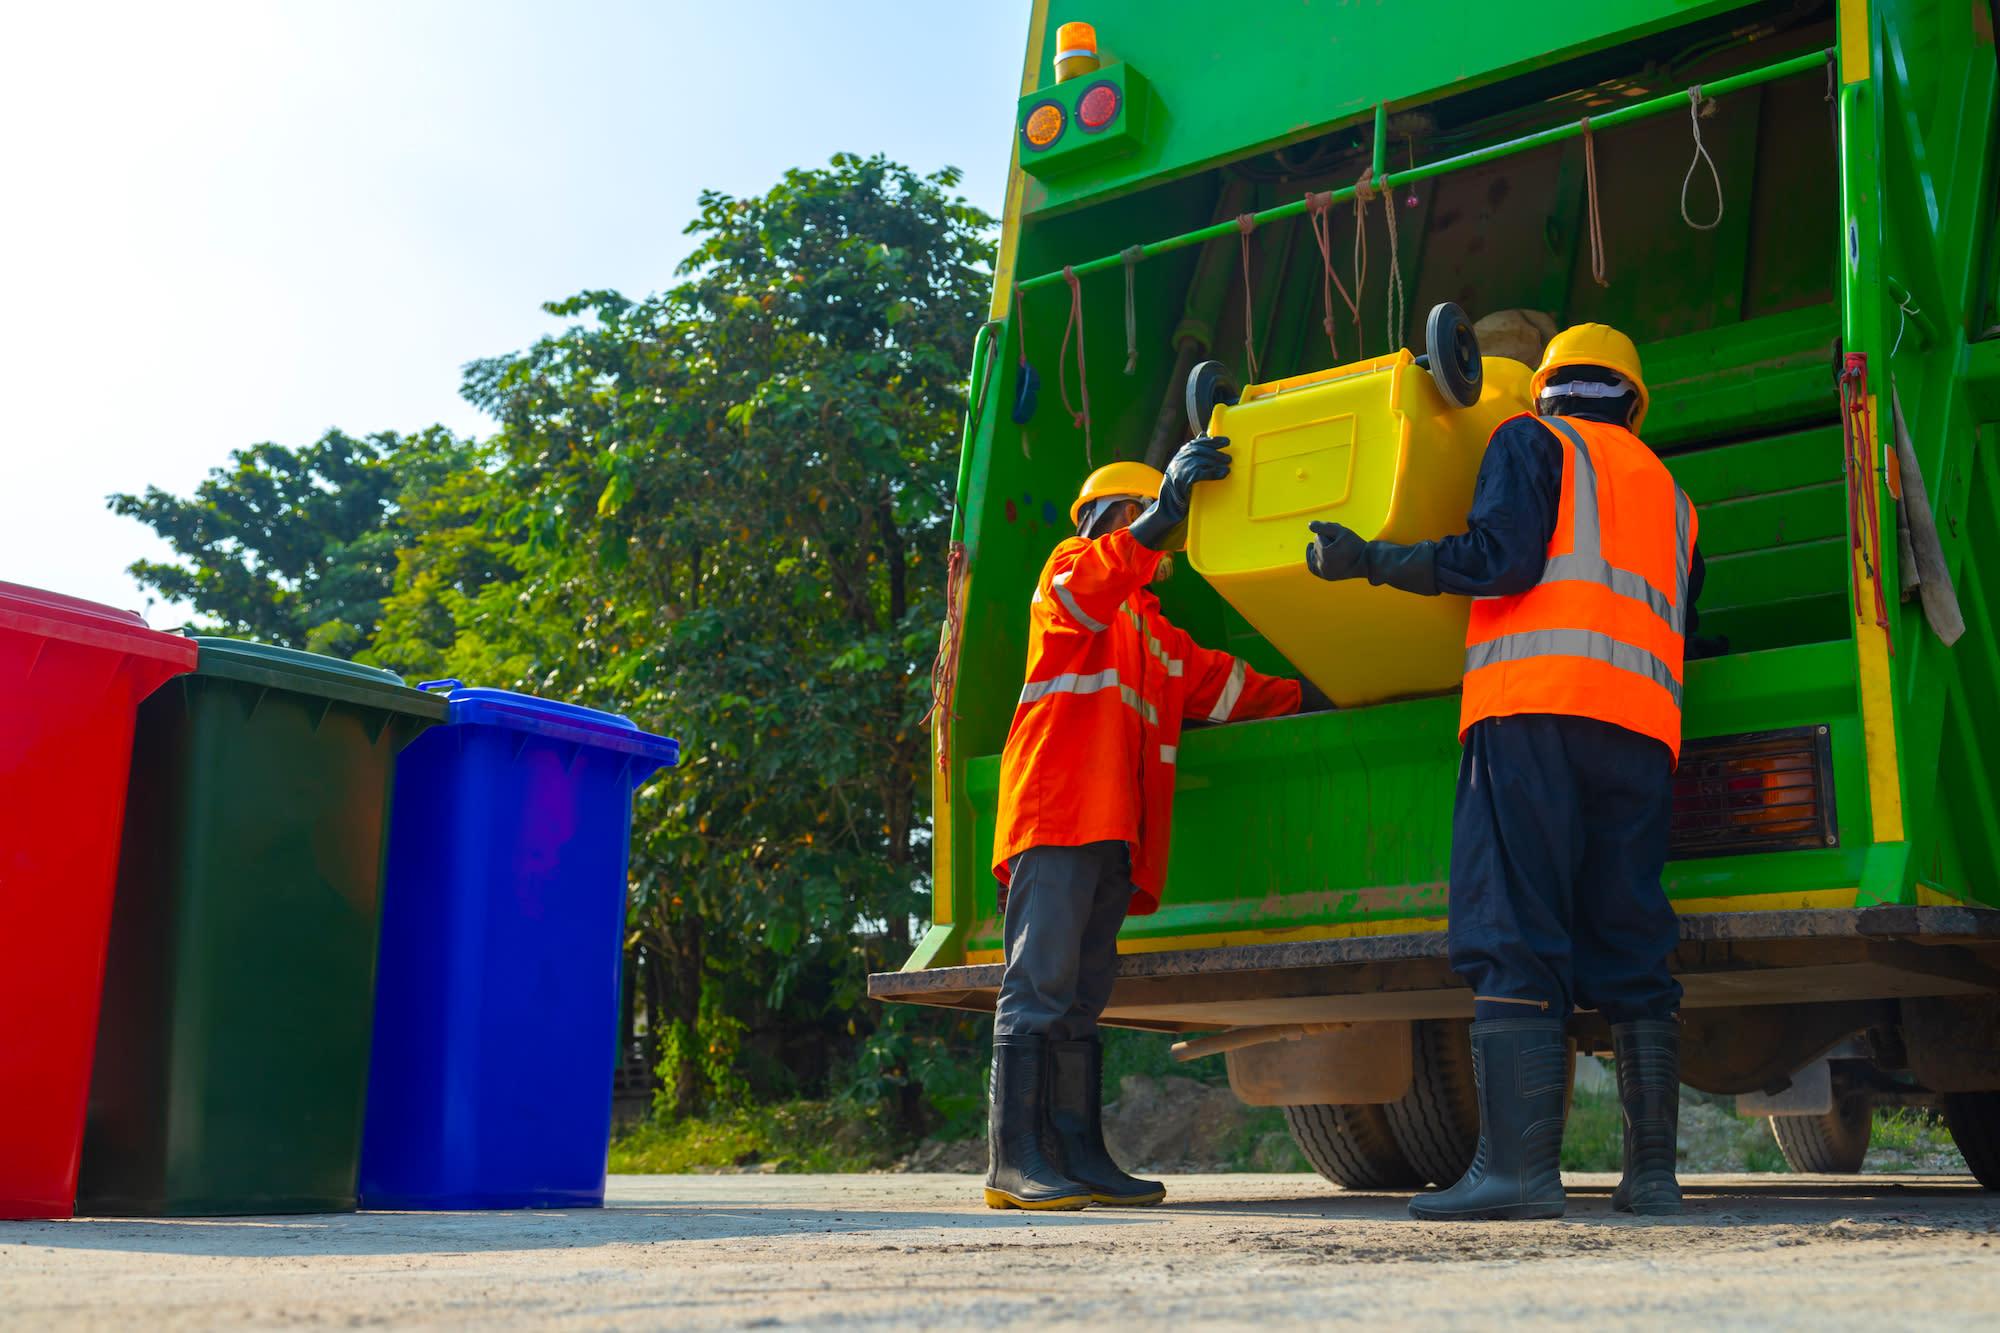 Incoming economic data may be 'garbage': Morning Brief